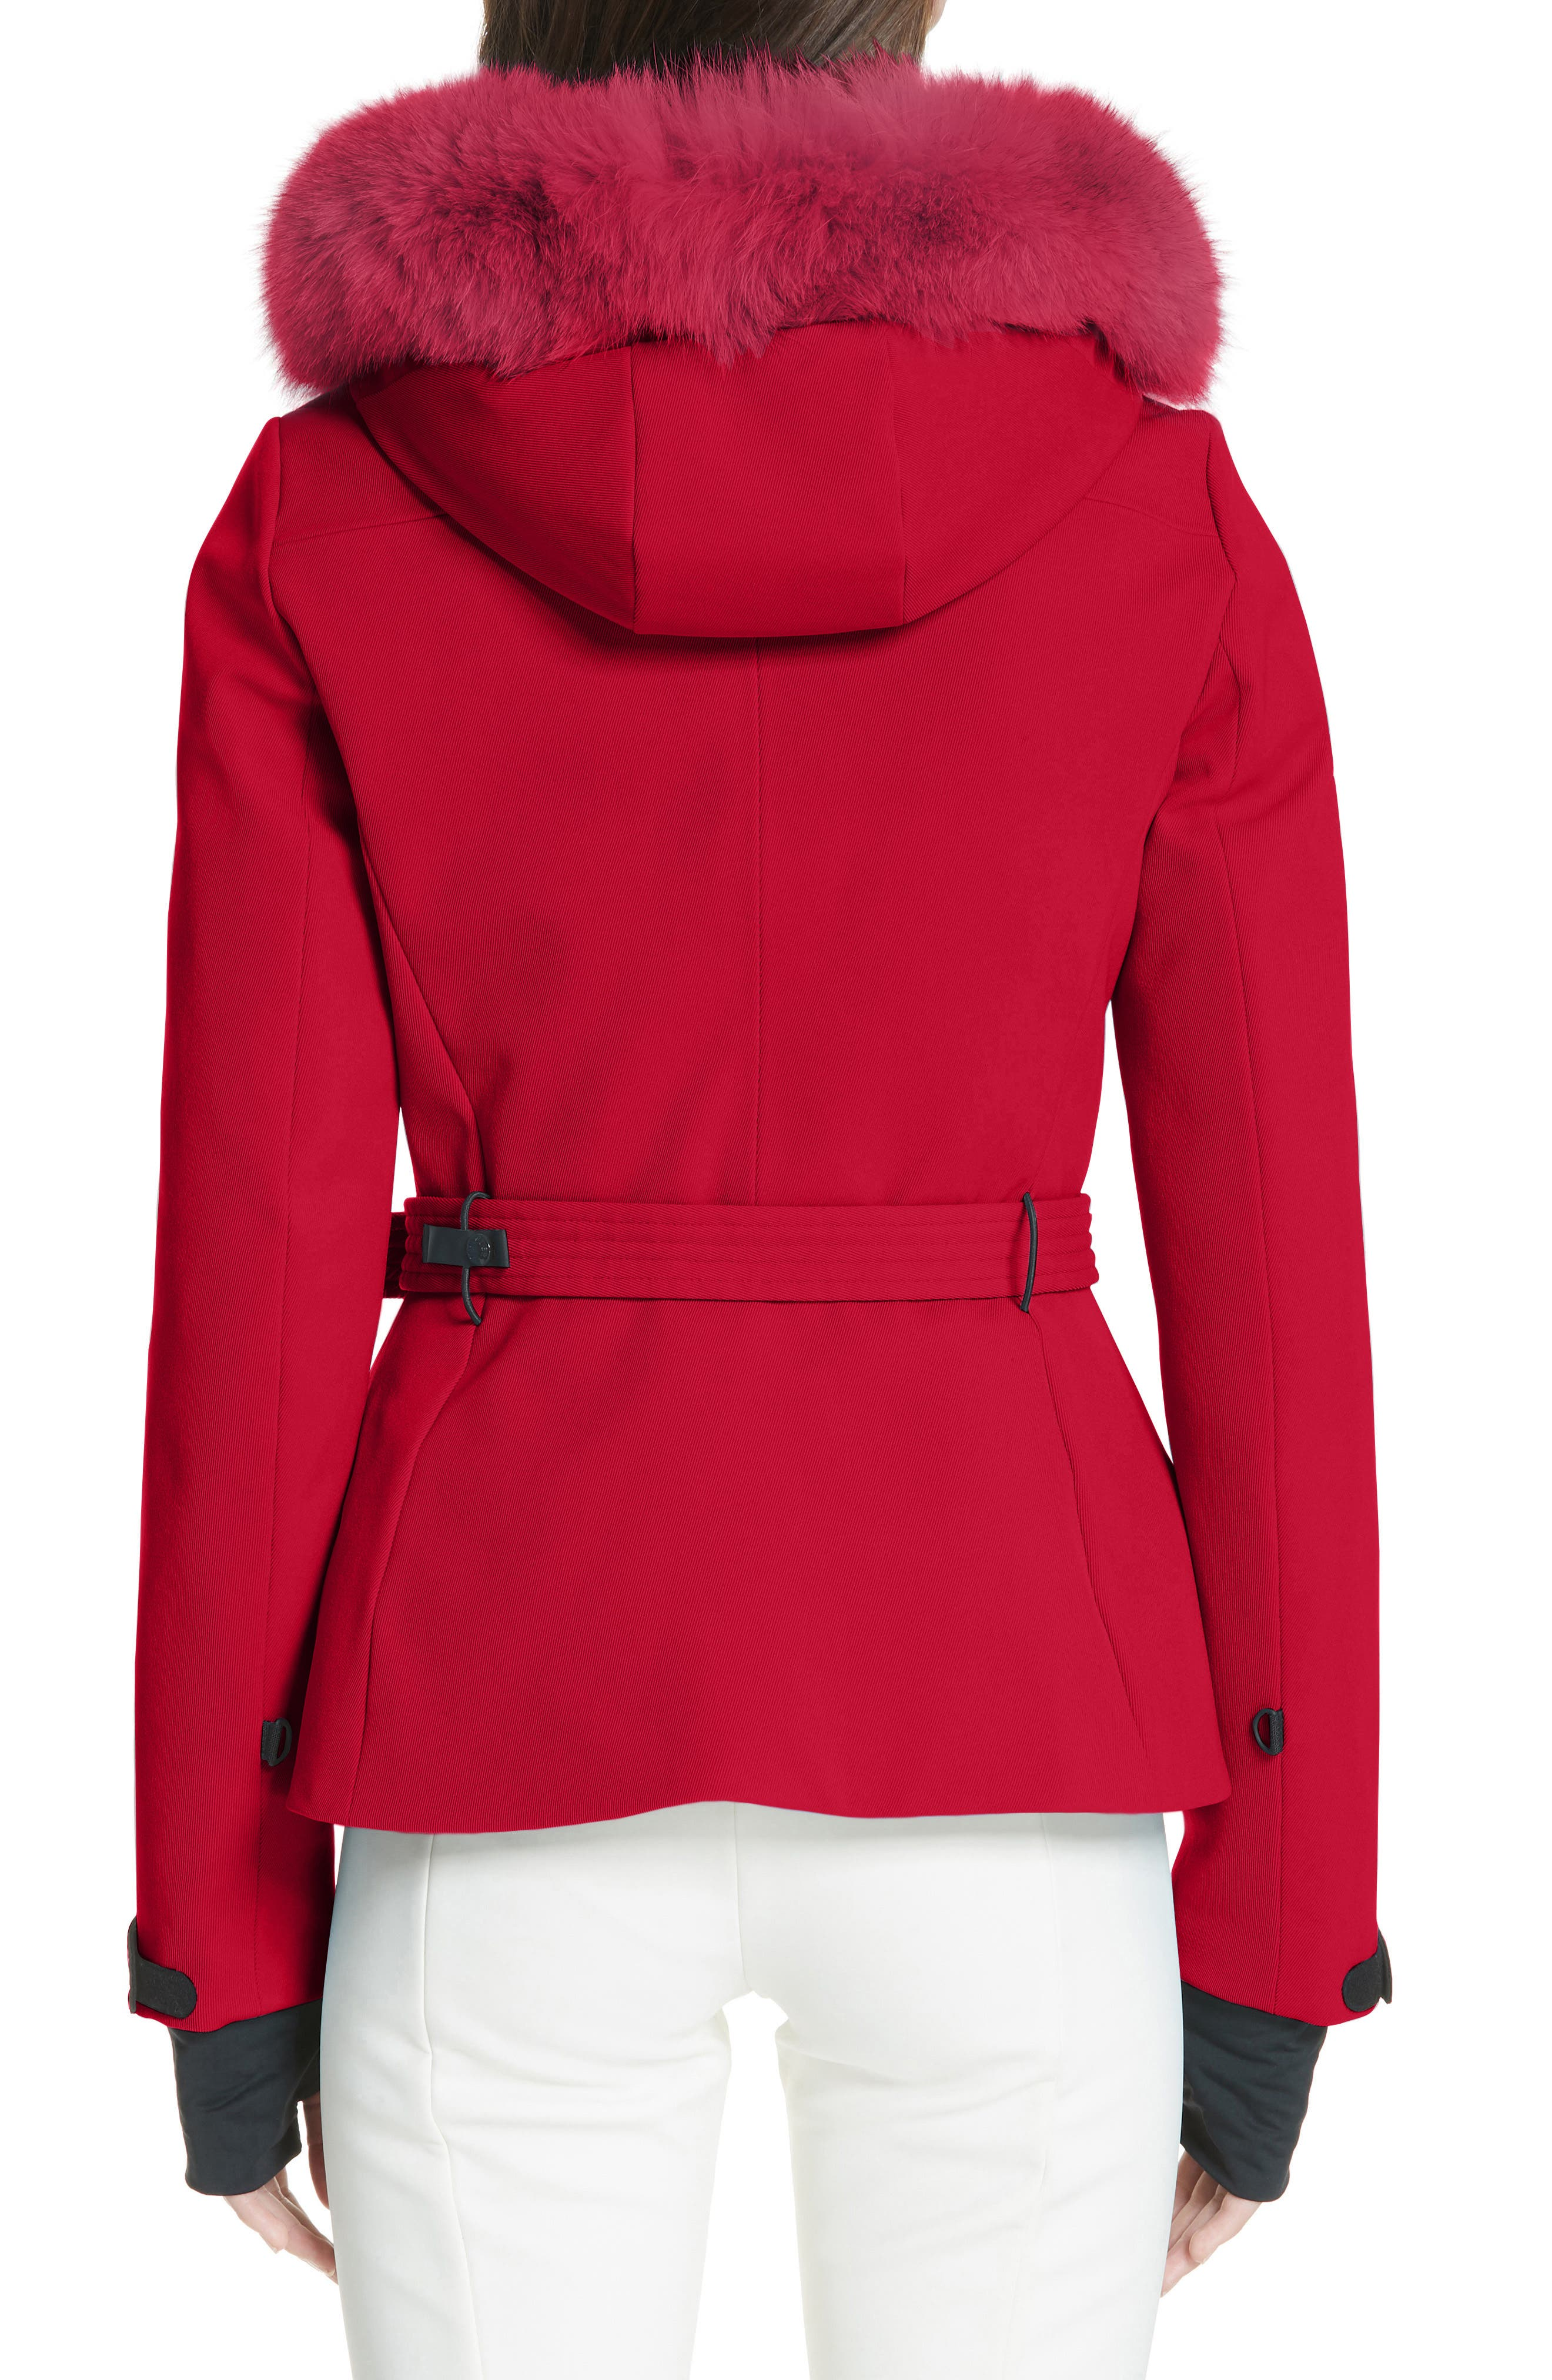 MONCLER,                             Bauges Water Repellent Hooded Down Coat with Detachable Genuine Fox Fur Trim,                             Alternate thumbnail 2, color,                             RED